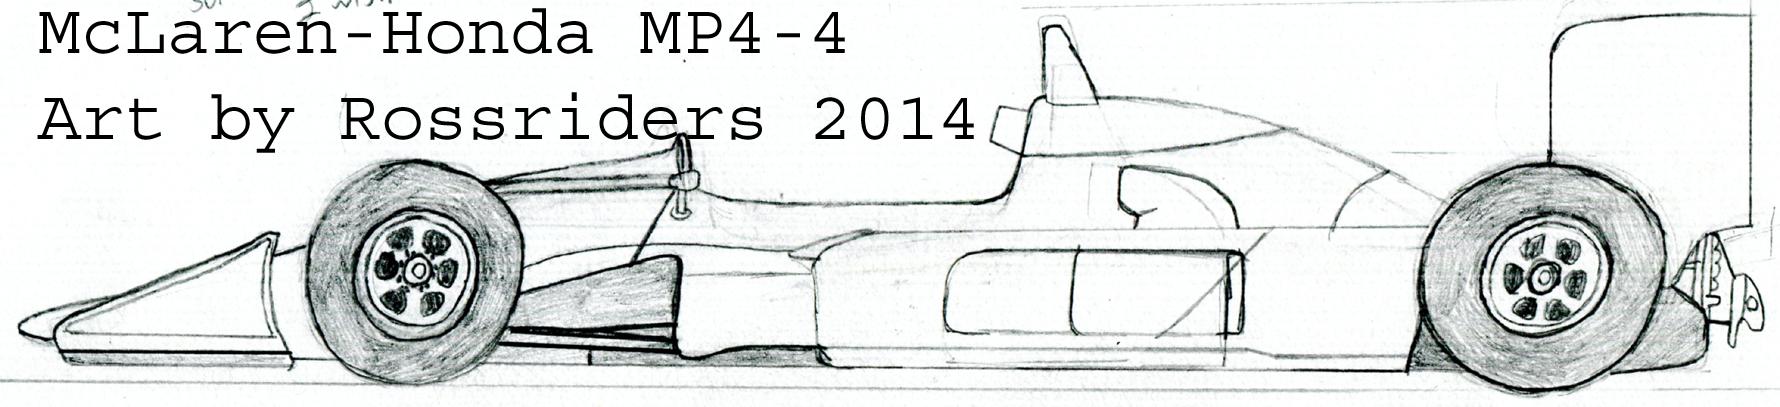 Mclaren Honda MP-4-4 Honda by rossriders